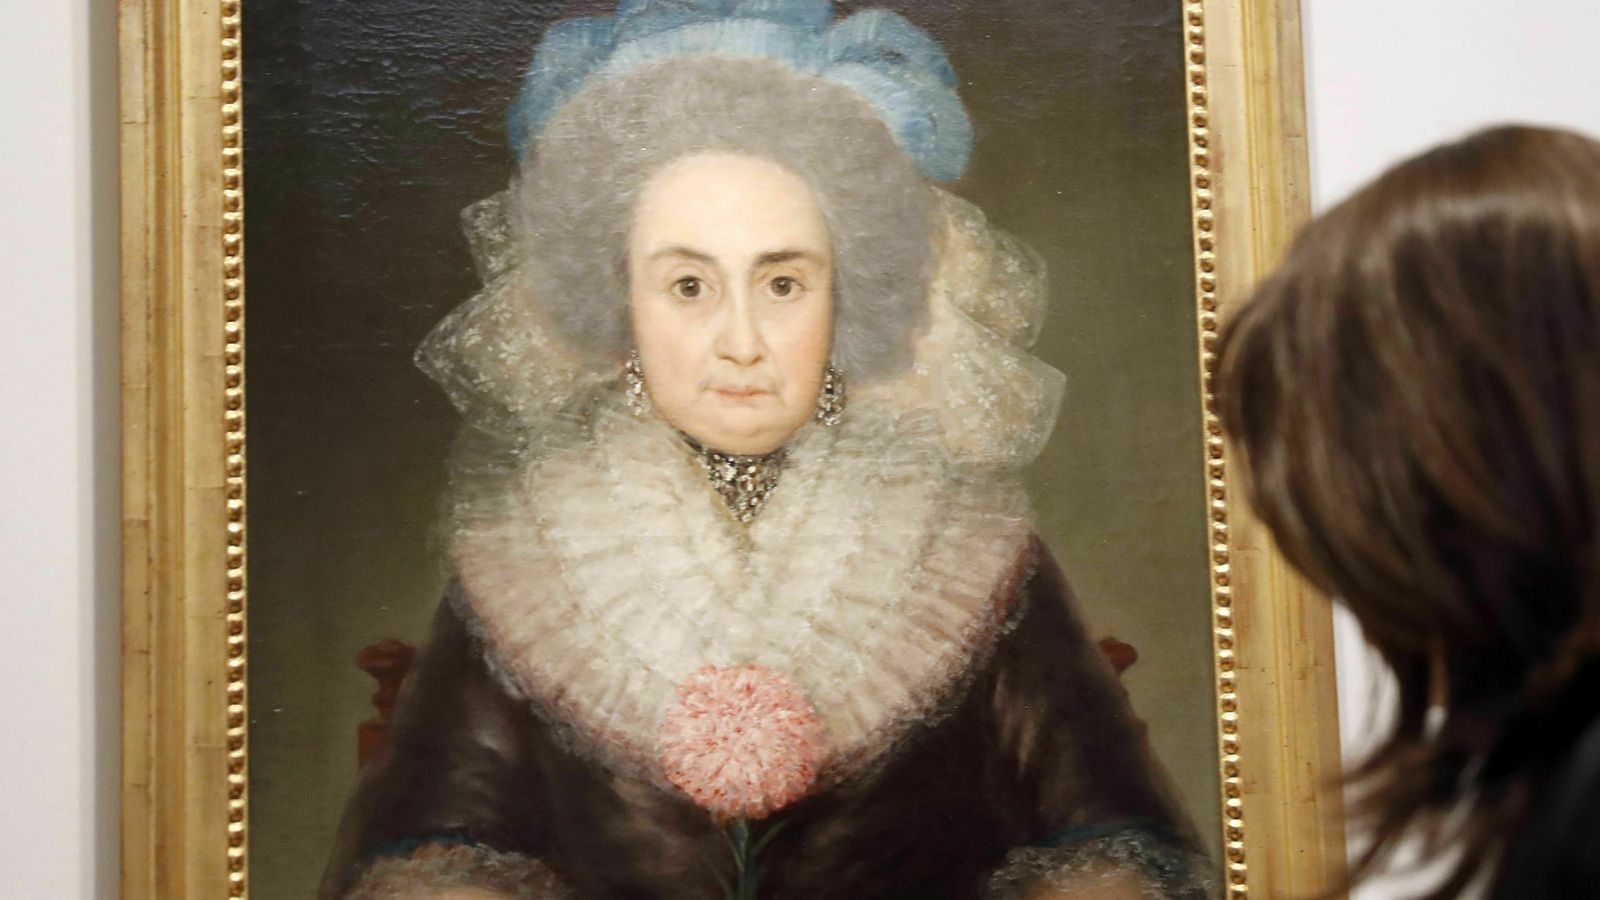 'Retrat de Bernarda Tavira', de Francisco de Goya